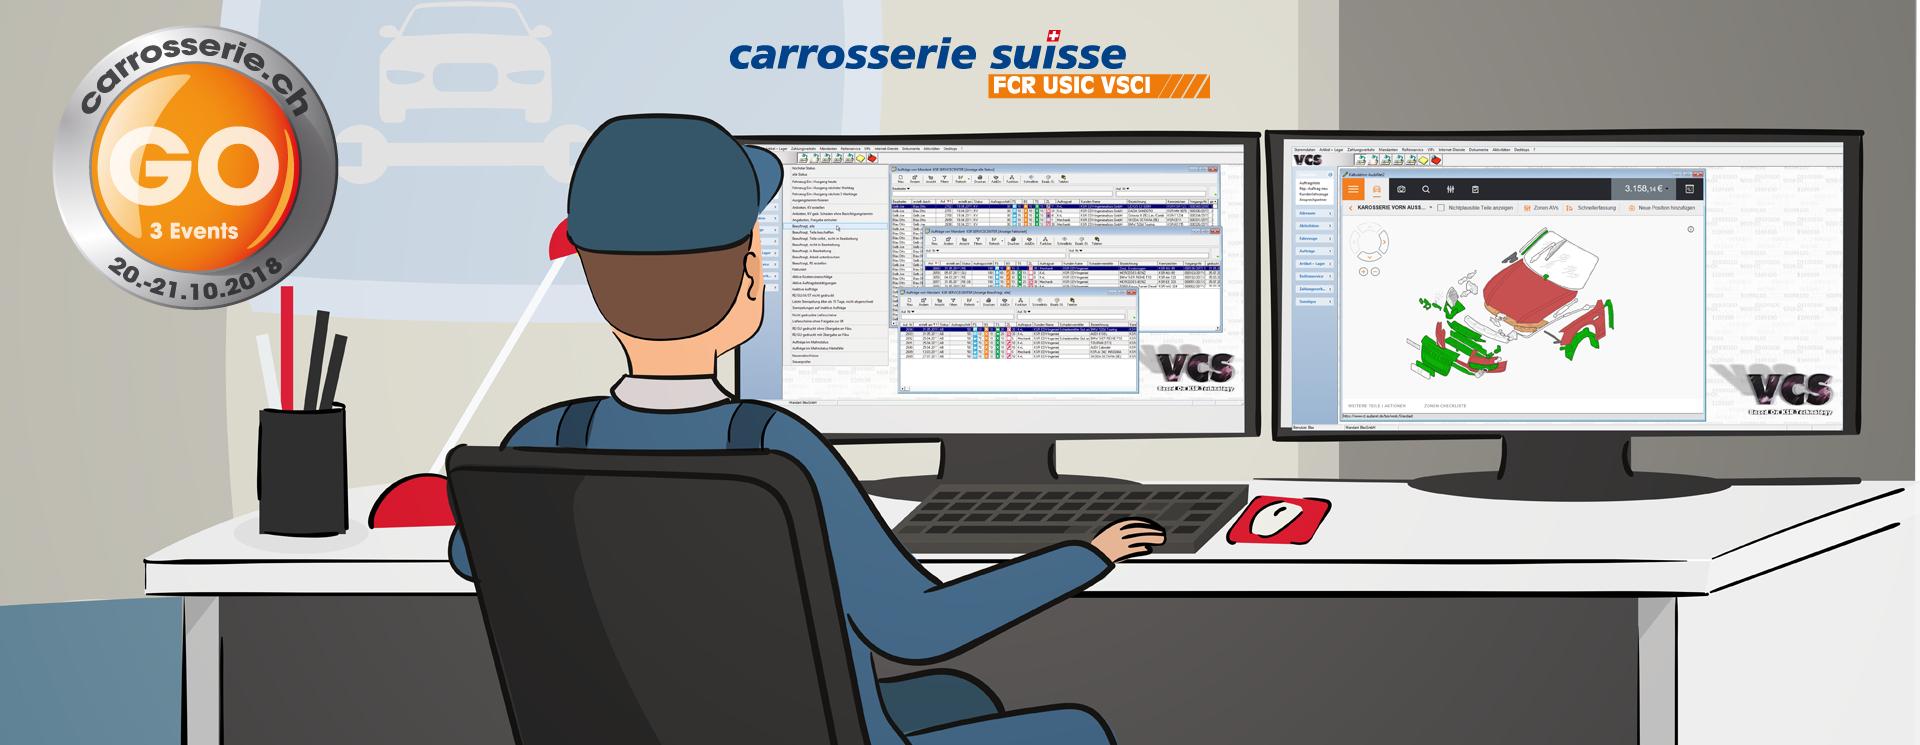 Carrosserie Suisse Branchen Event Thun